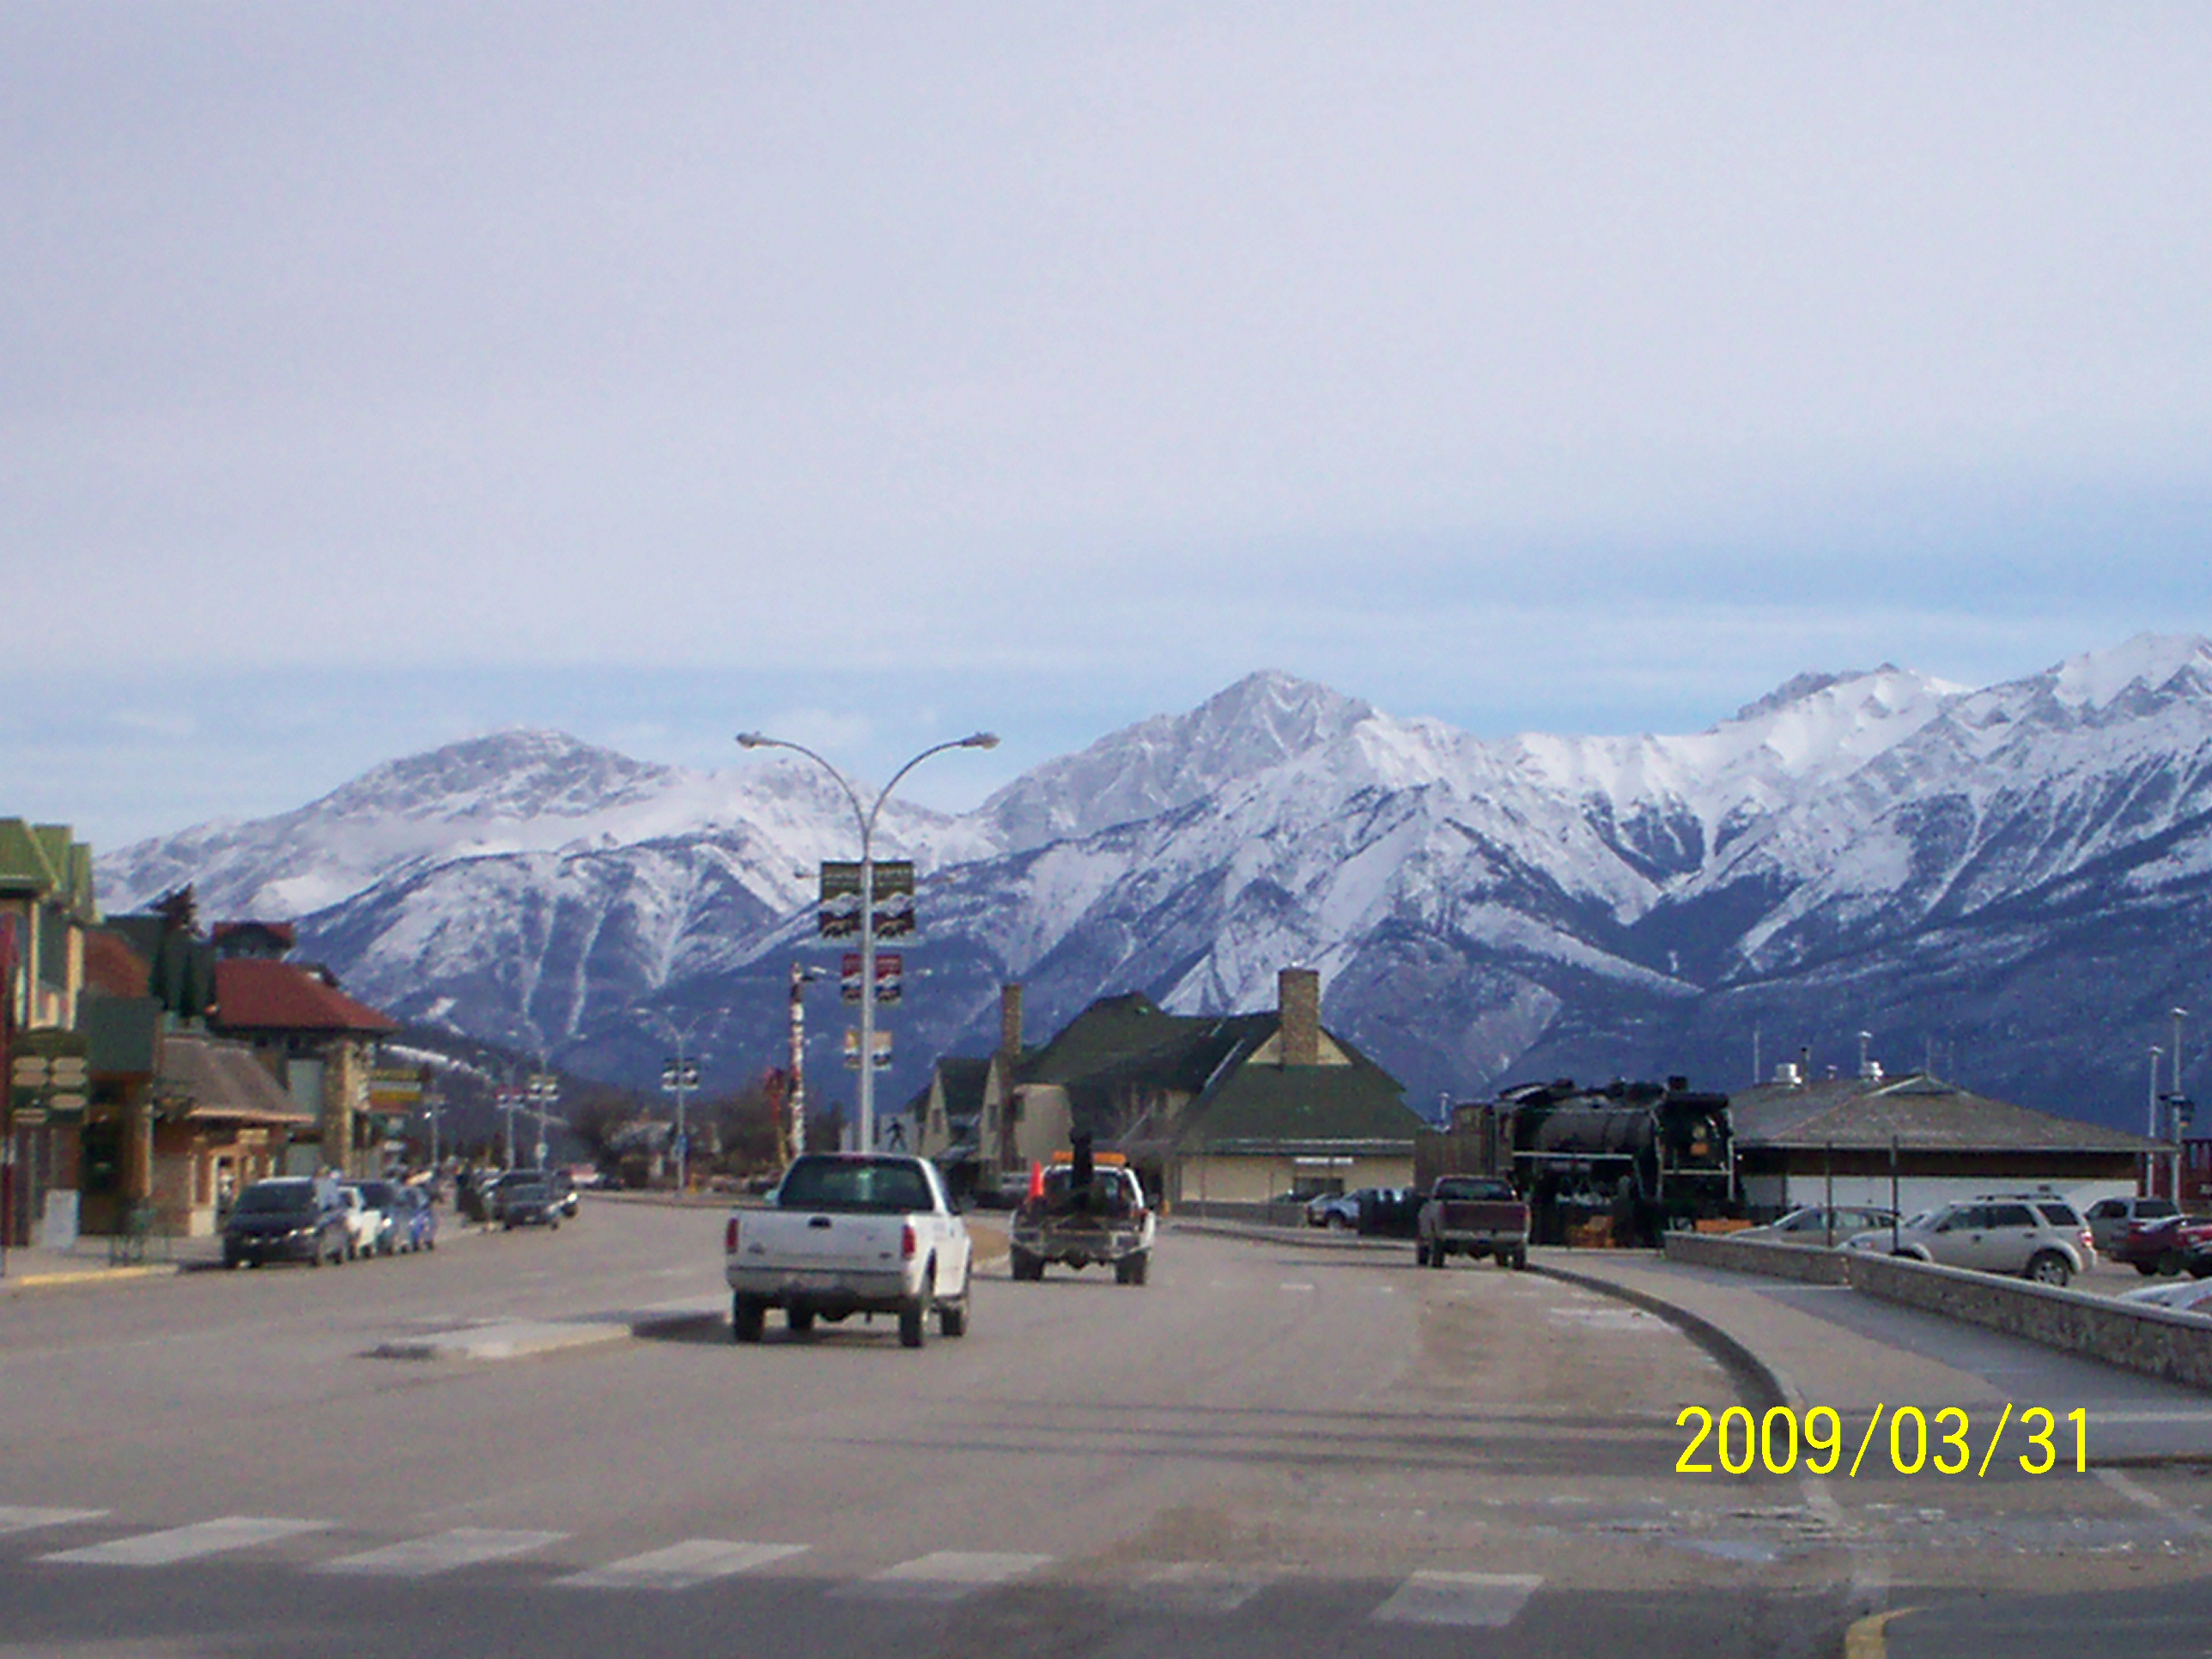 Main drag in Jasper, AB